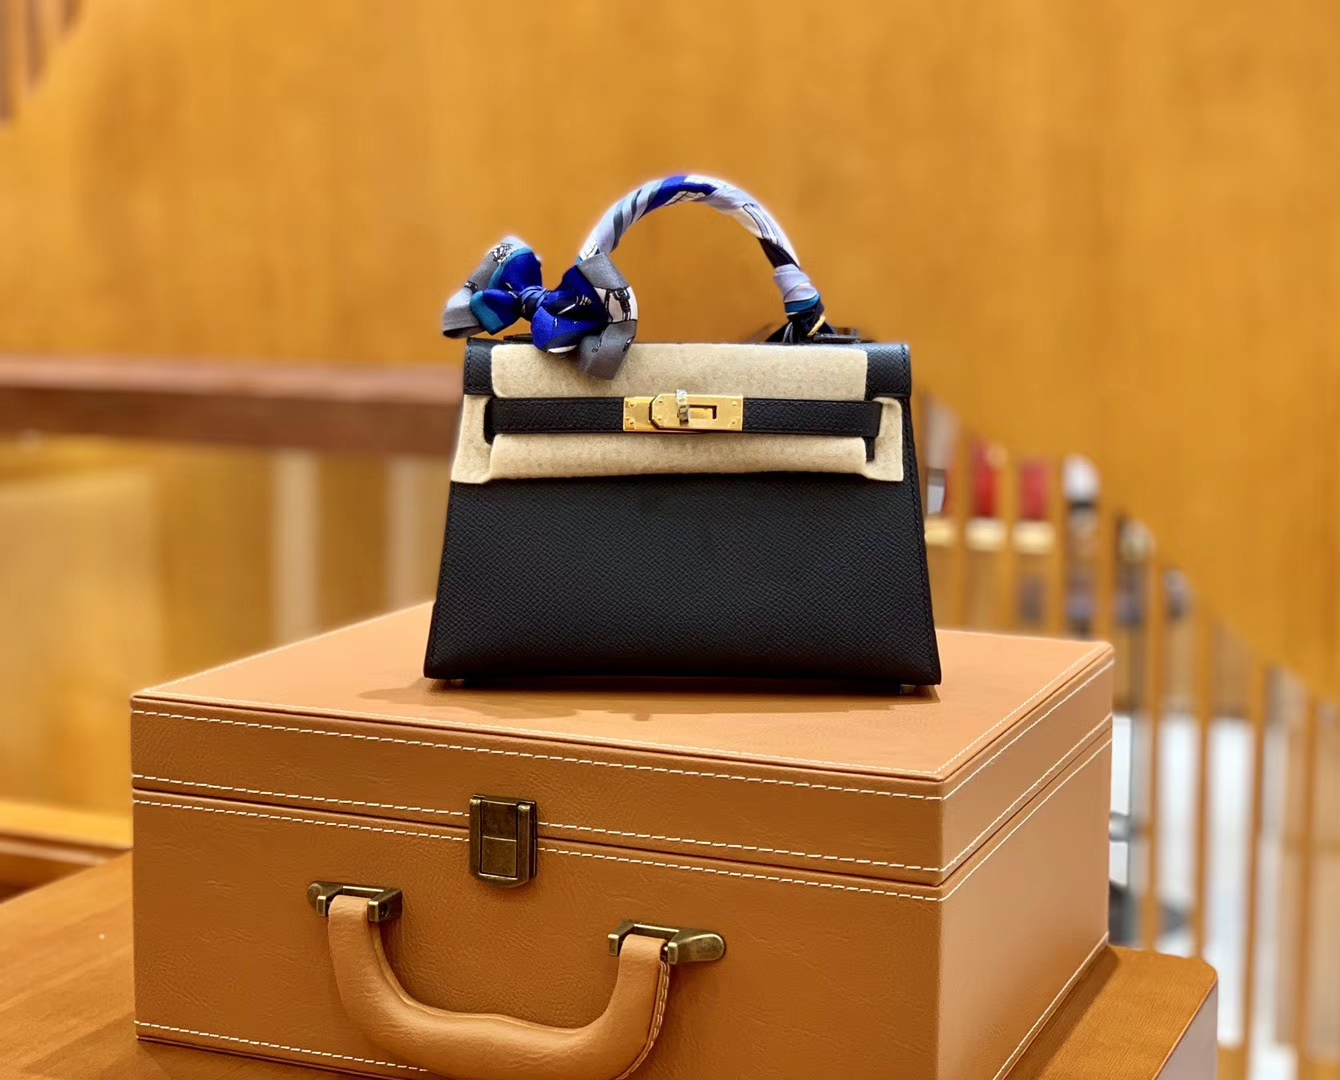 Hermès(爱马仕)MiniKelly 迷你凯莉 掌纹牛皮 午夜蓝 2代 19cm